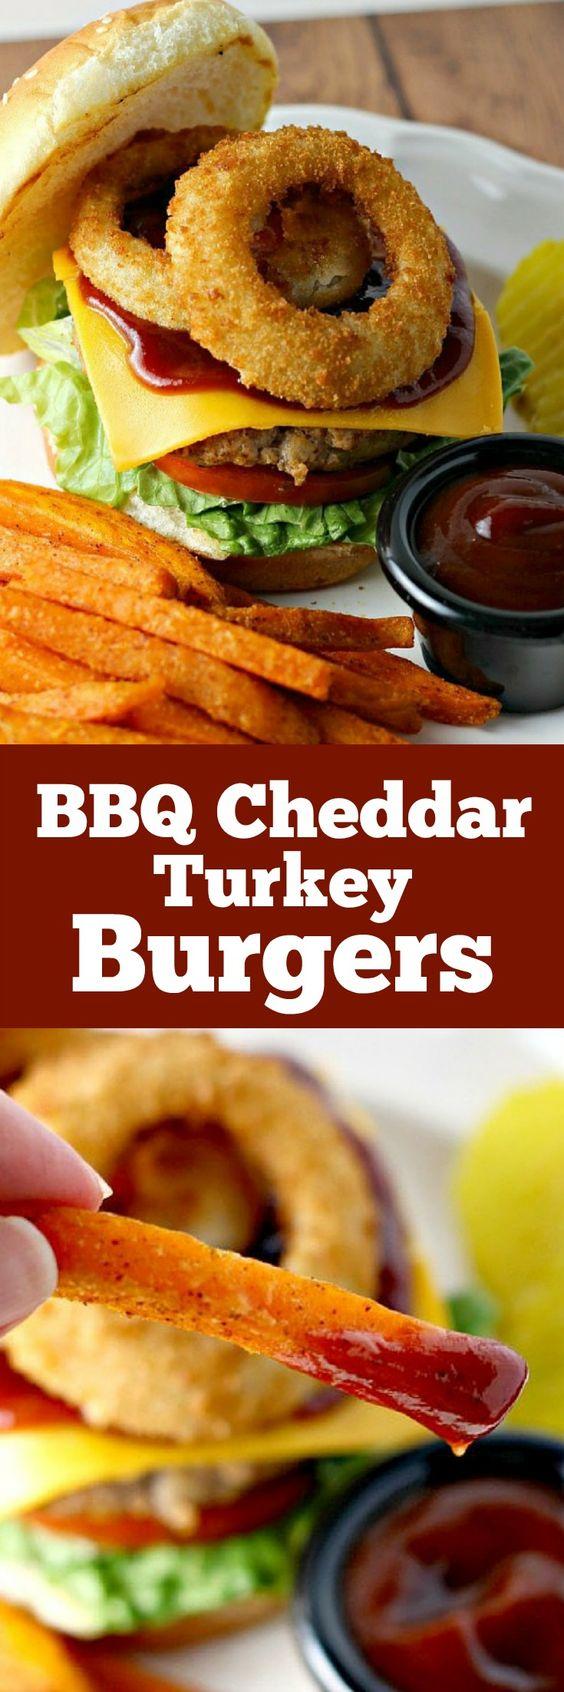 BBQ Cheddar Turkey Burgers | Cheddar, Onion rings and Rings